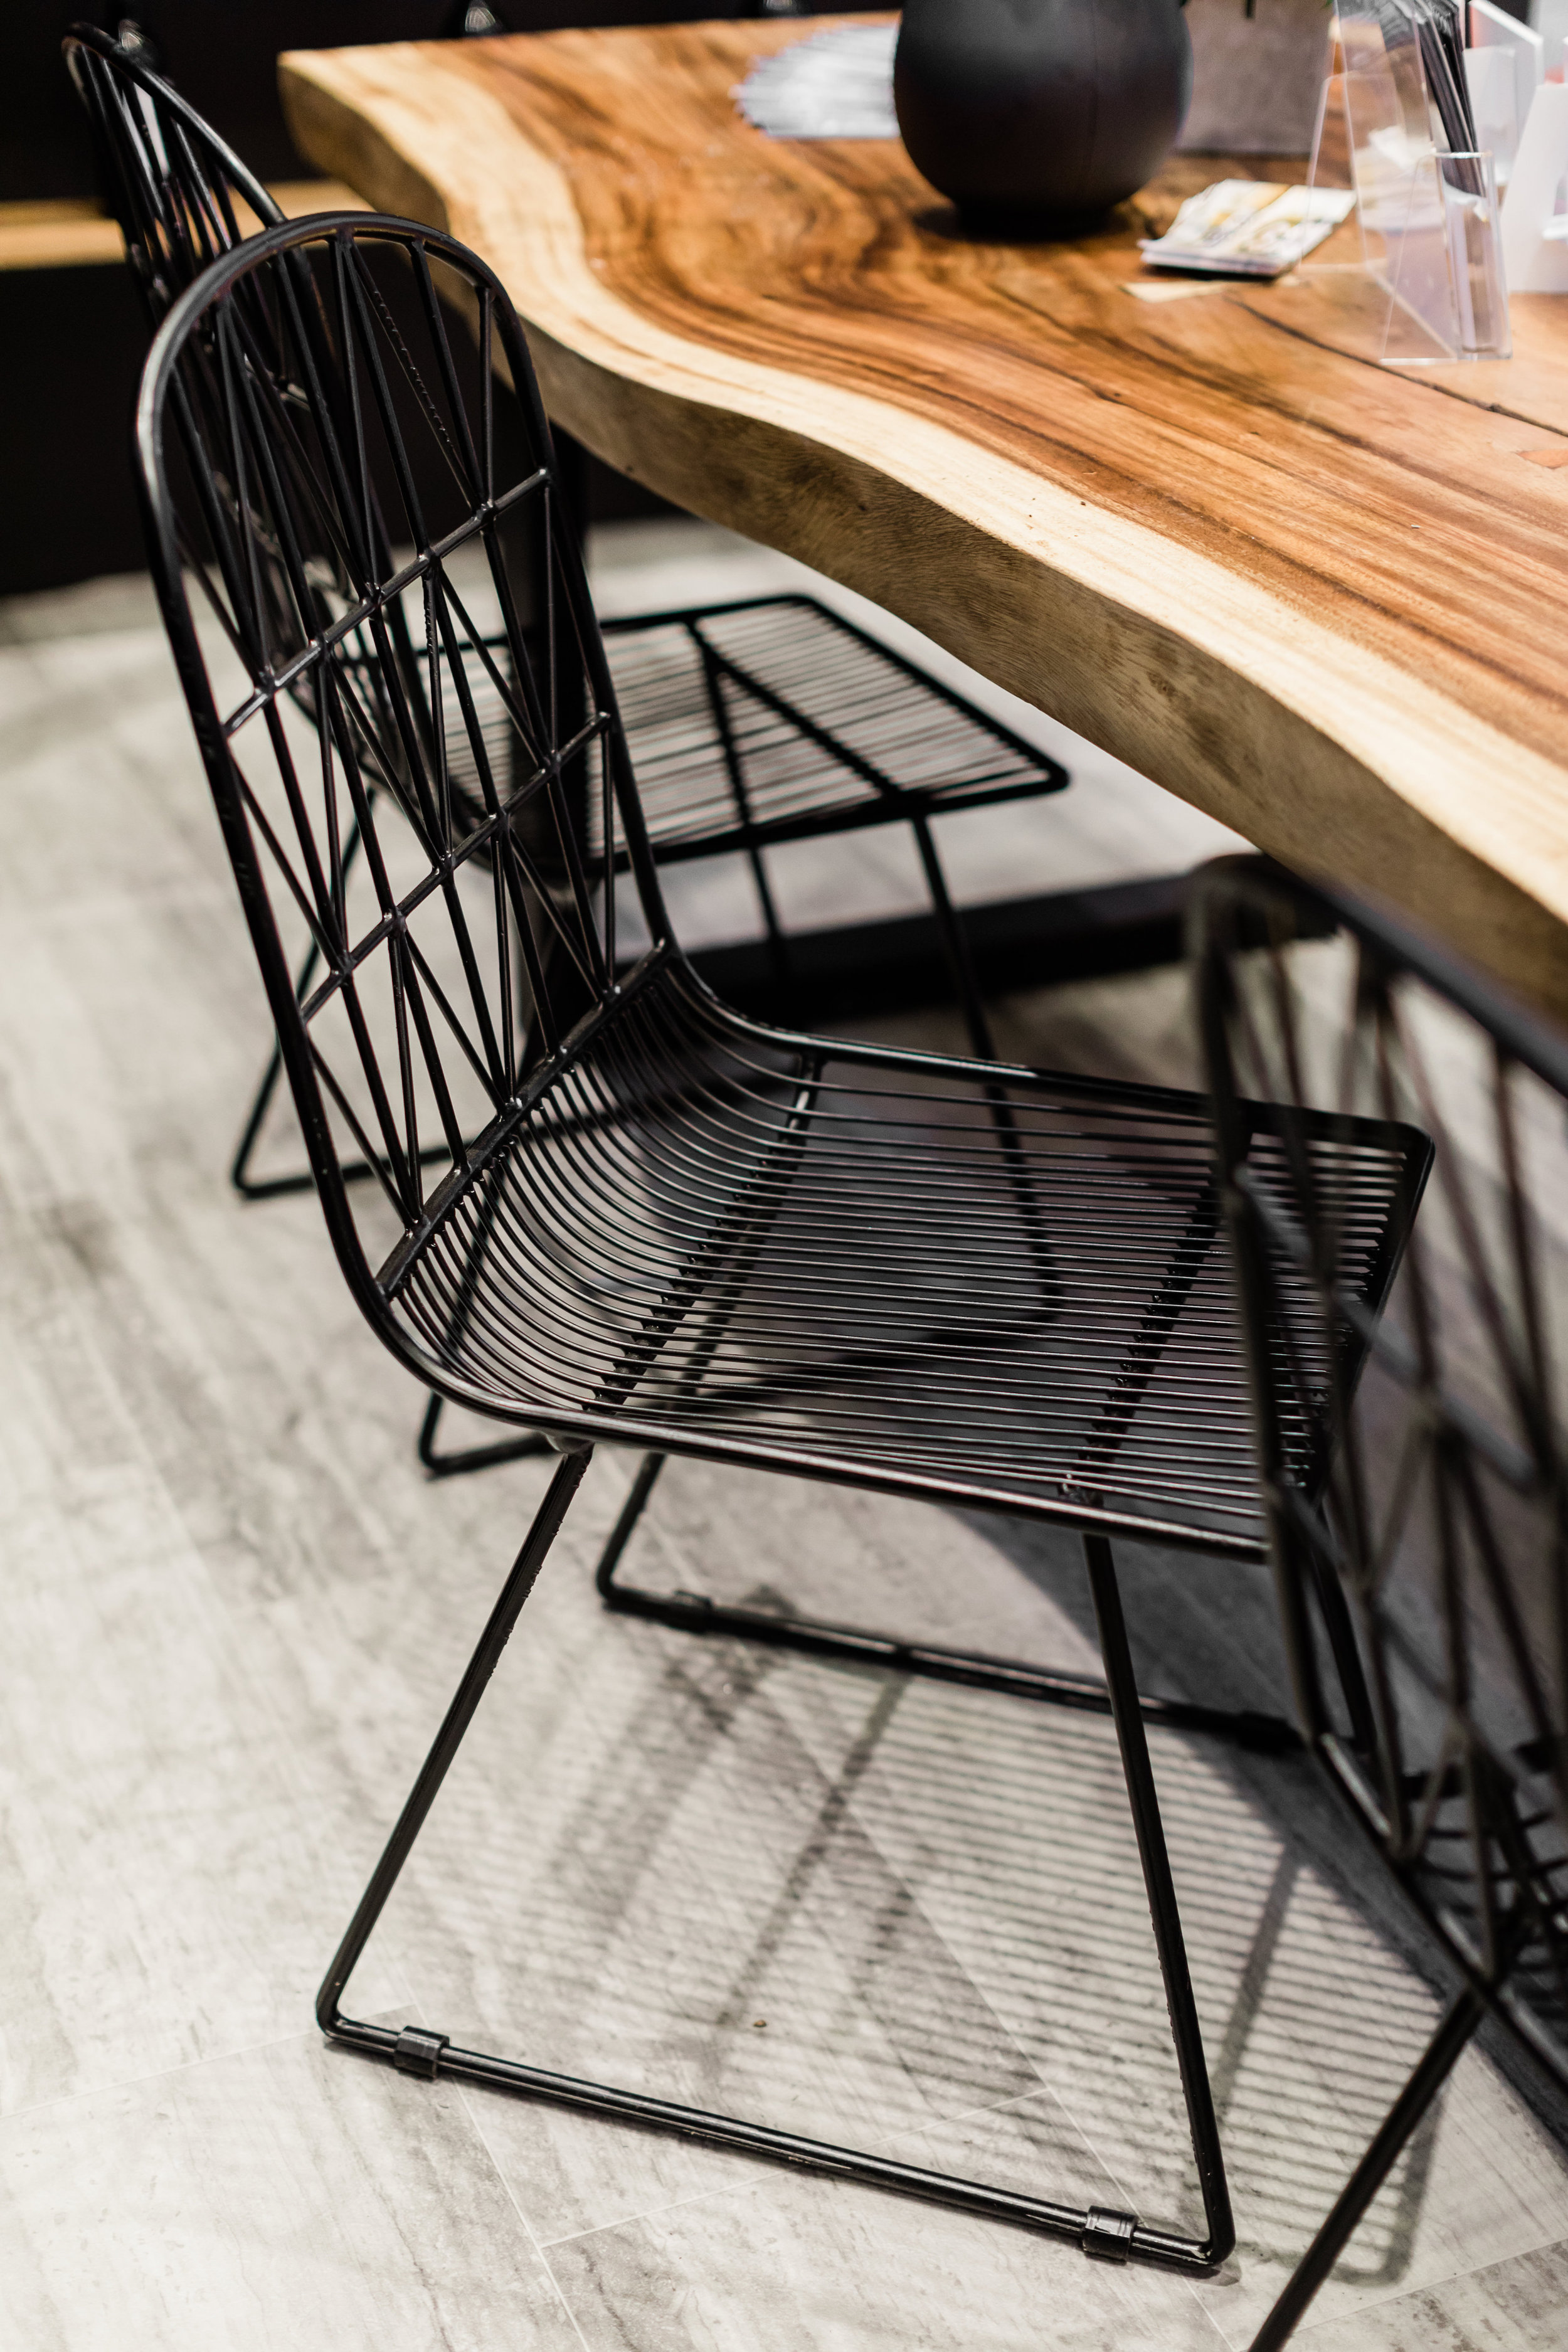 Winnipeg Renovation Show. The design Studio. Blue Moon Furniture. Black wire chairs.